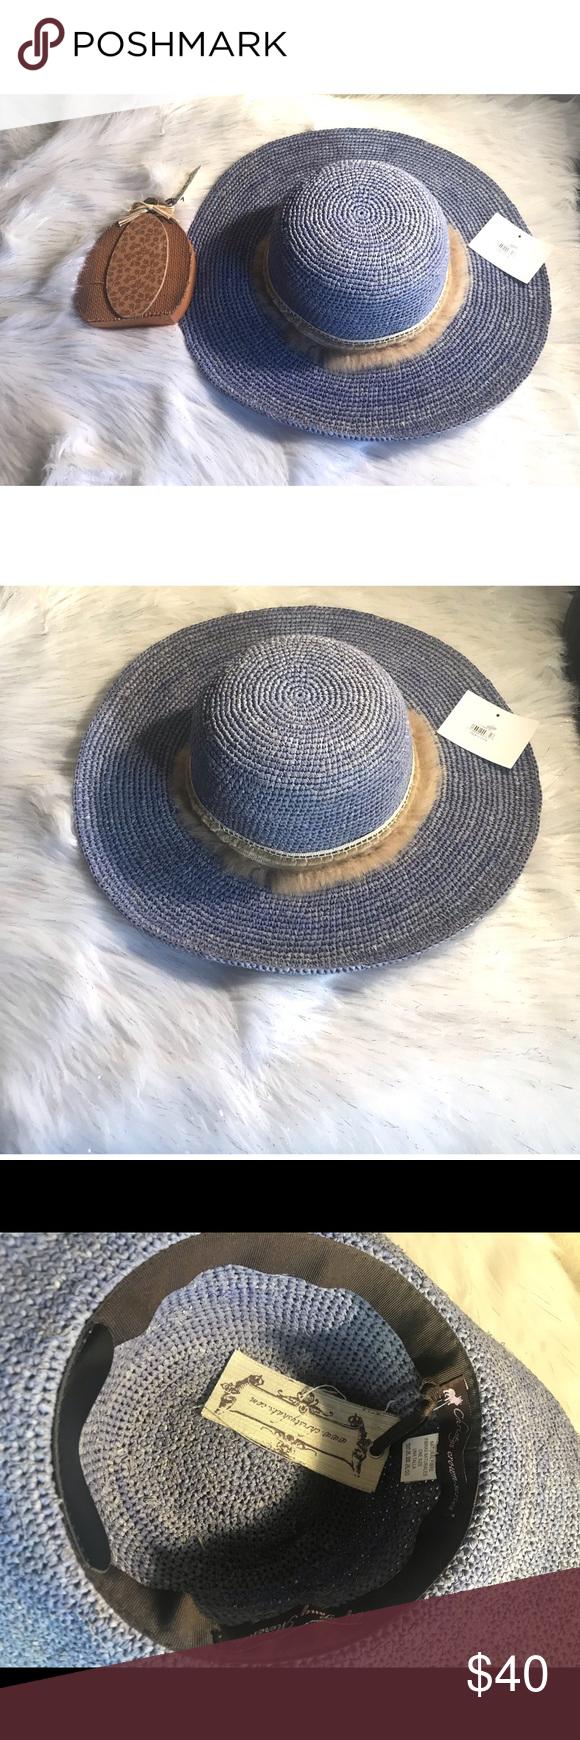 new high quality utterly stylish fresh styles Christys crown series hat Christys Crown Series hat NWT One ...